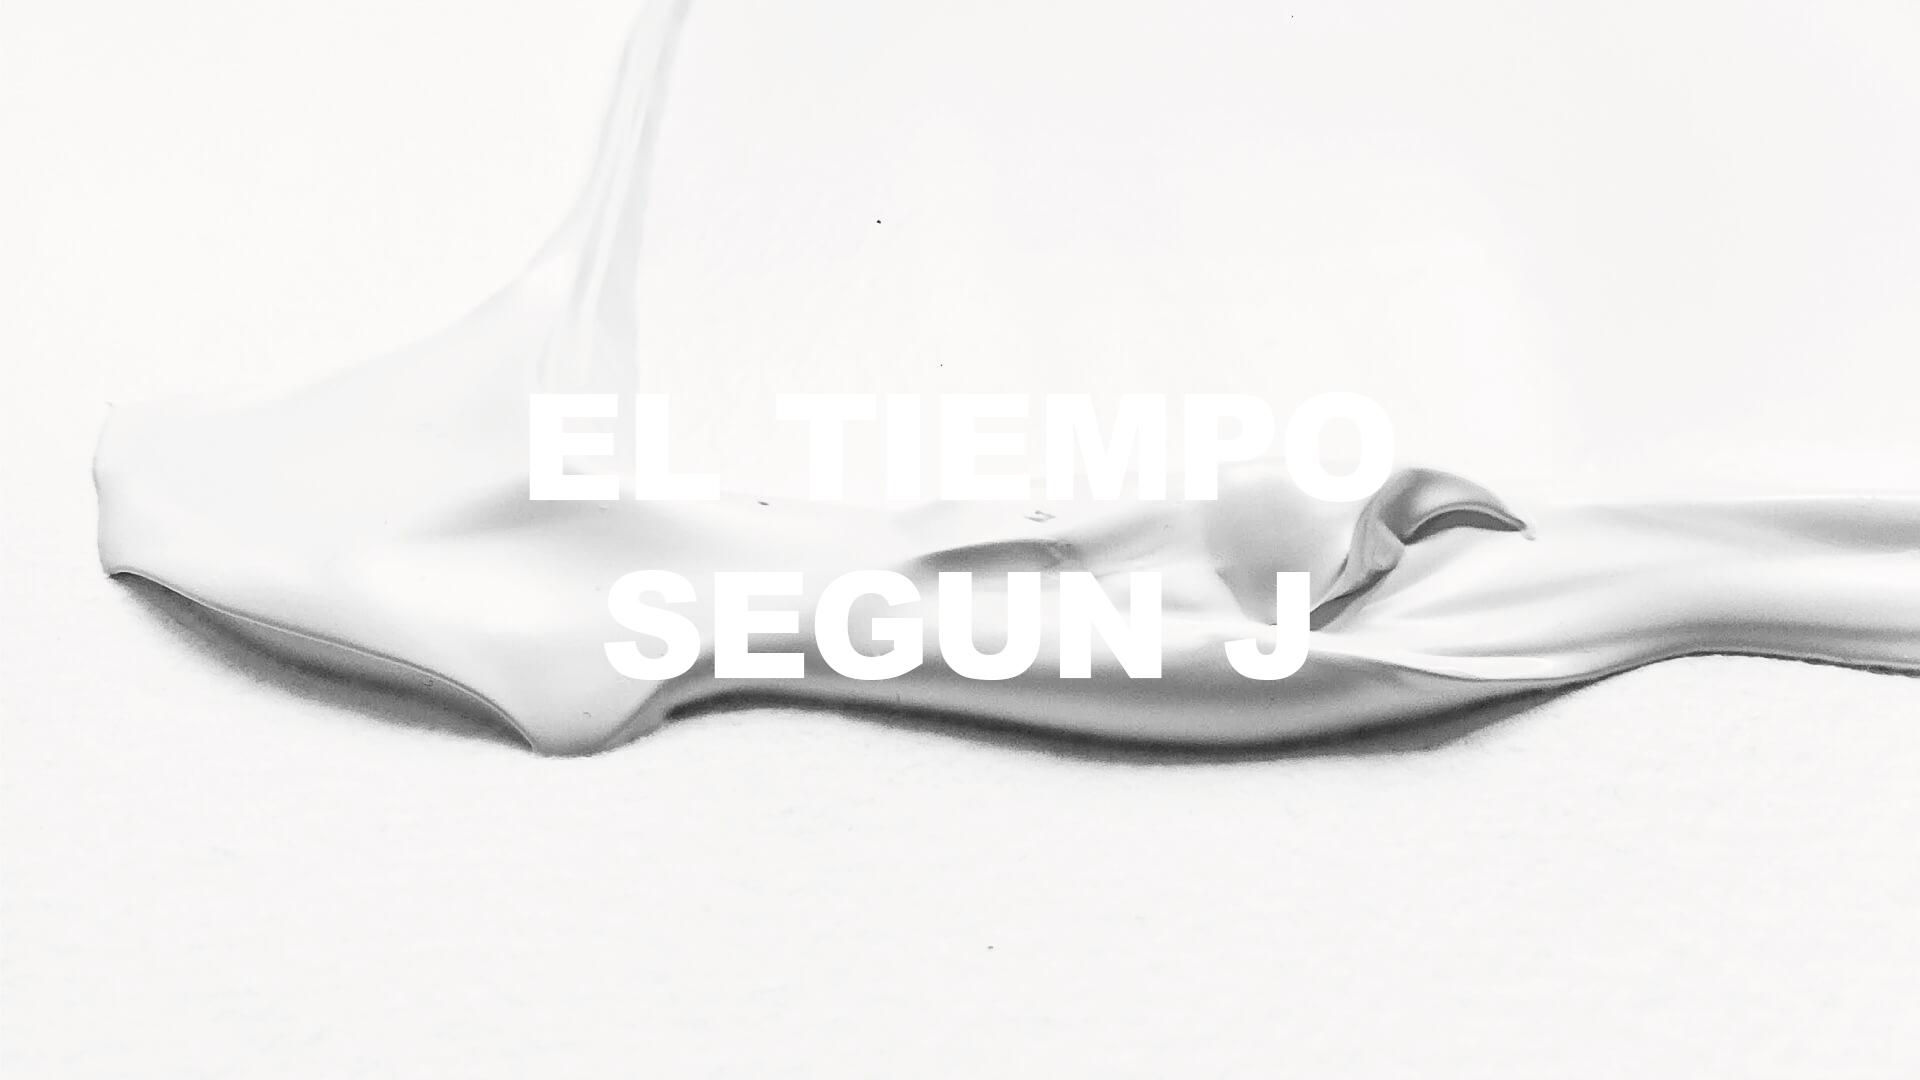 ELTIEMPO-AARON-NACHTAILER-ART-ARTIST-MARBLE-COVER